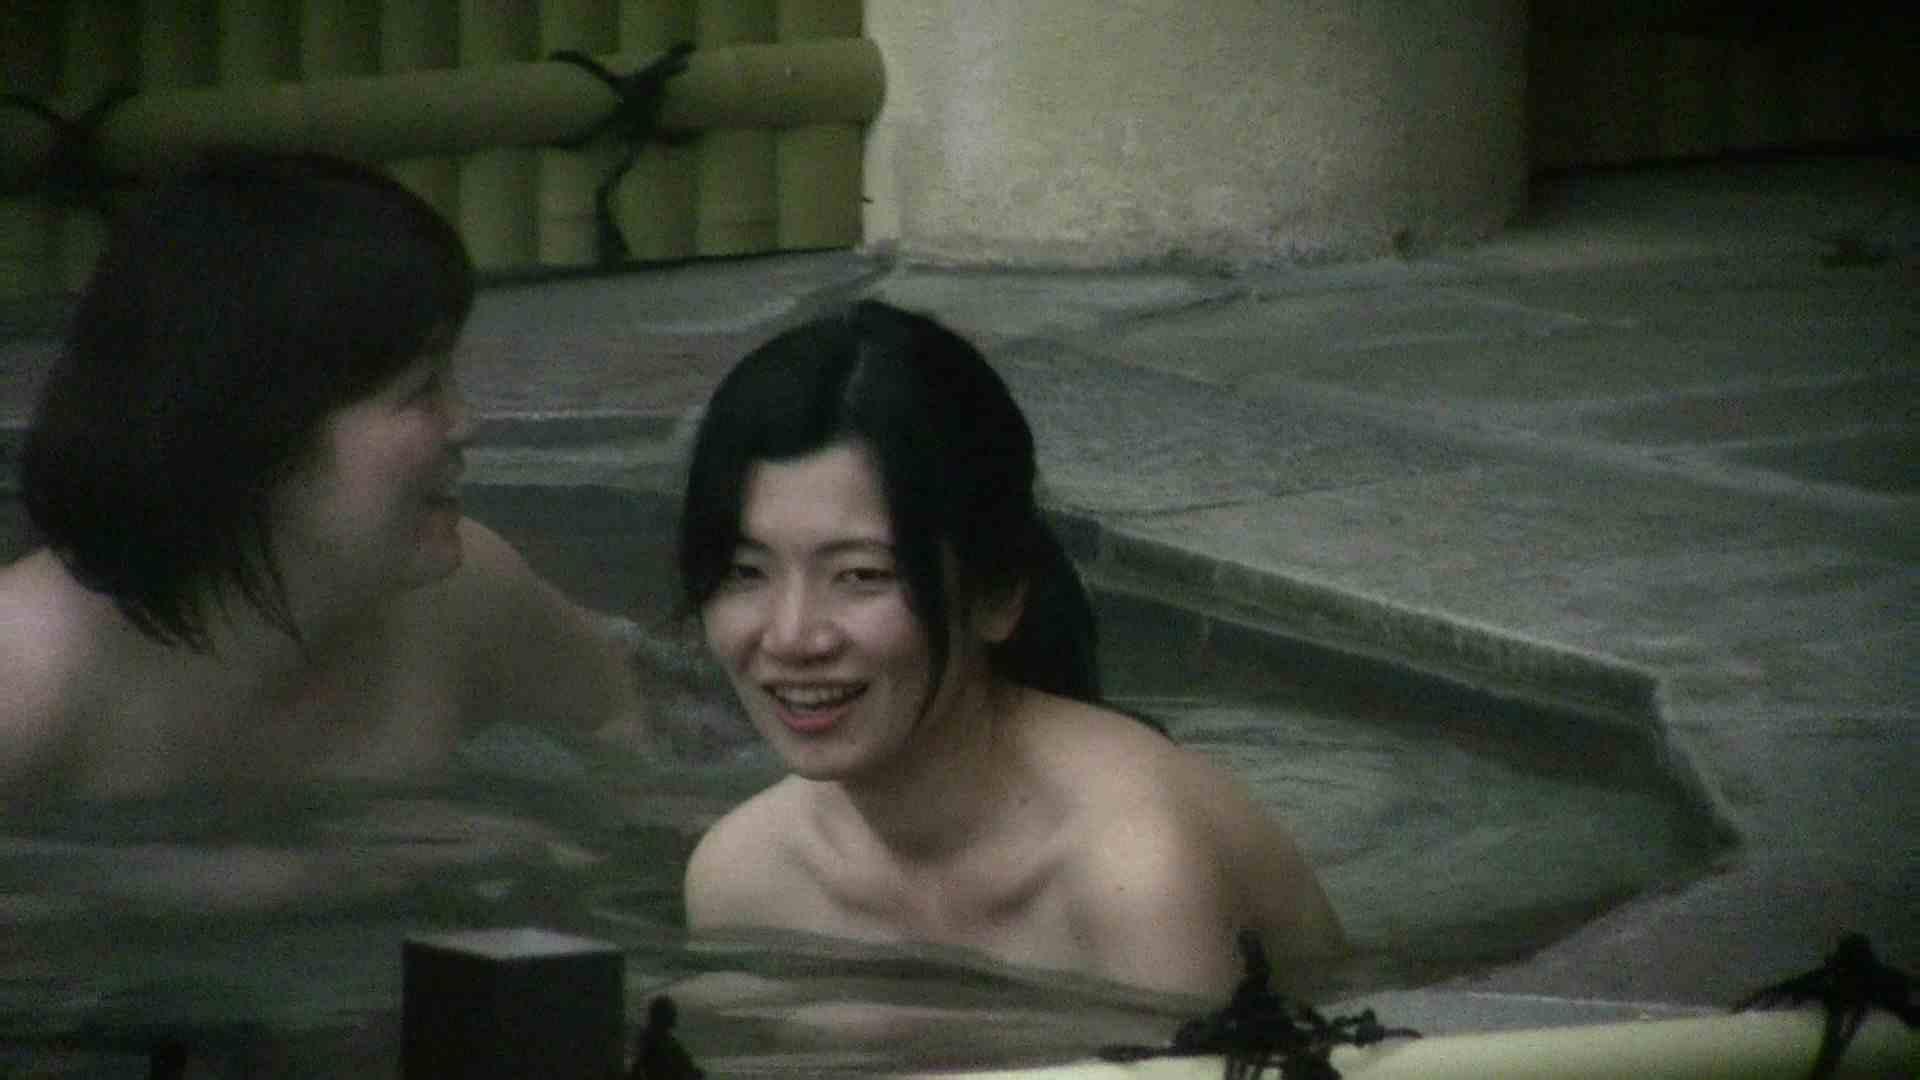 Aquaな露天風呂Vol.539 OL女体  88連発 18